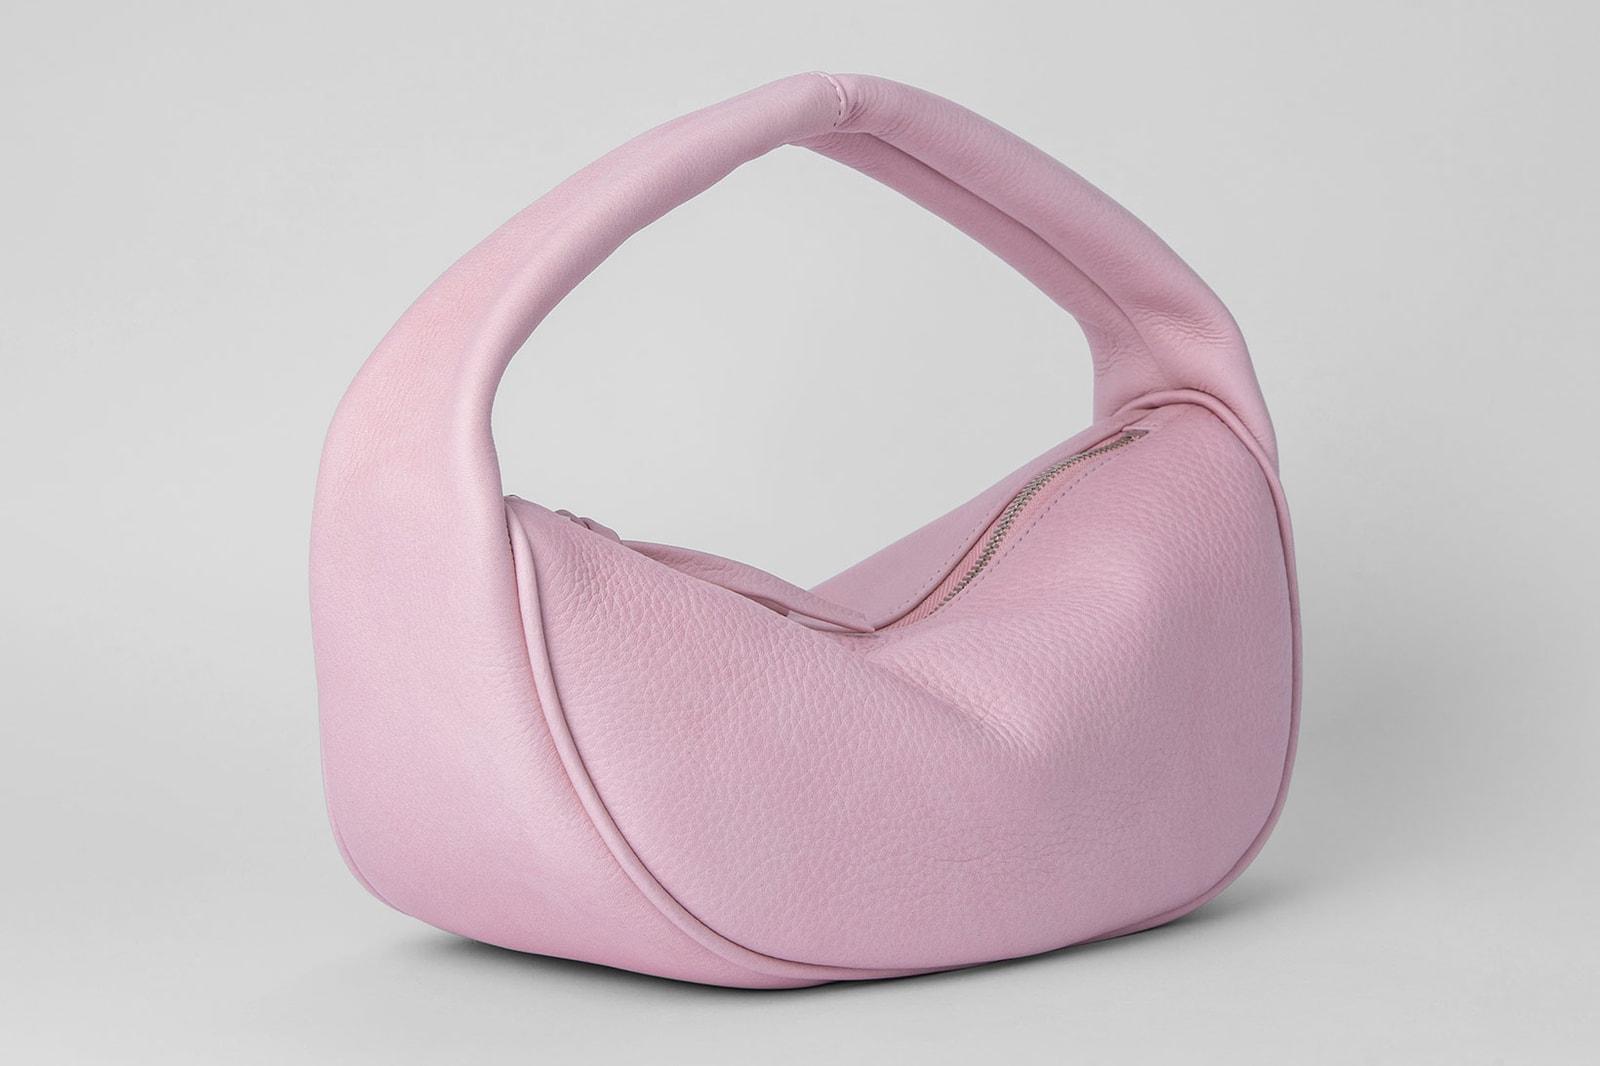 by far cush handbags pillow purses lime green papaya orange peony pink black price where to buy